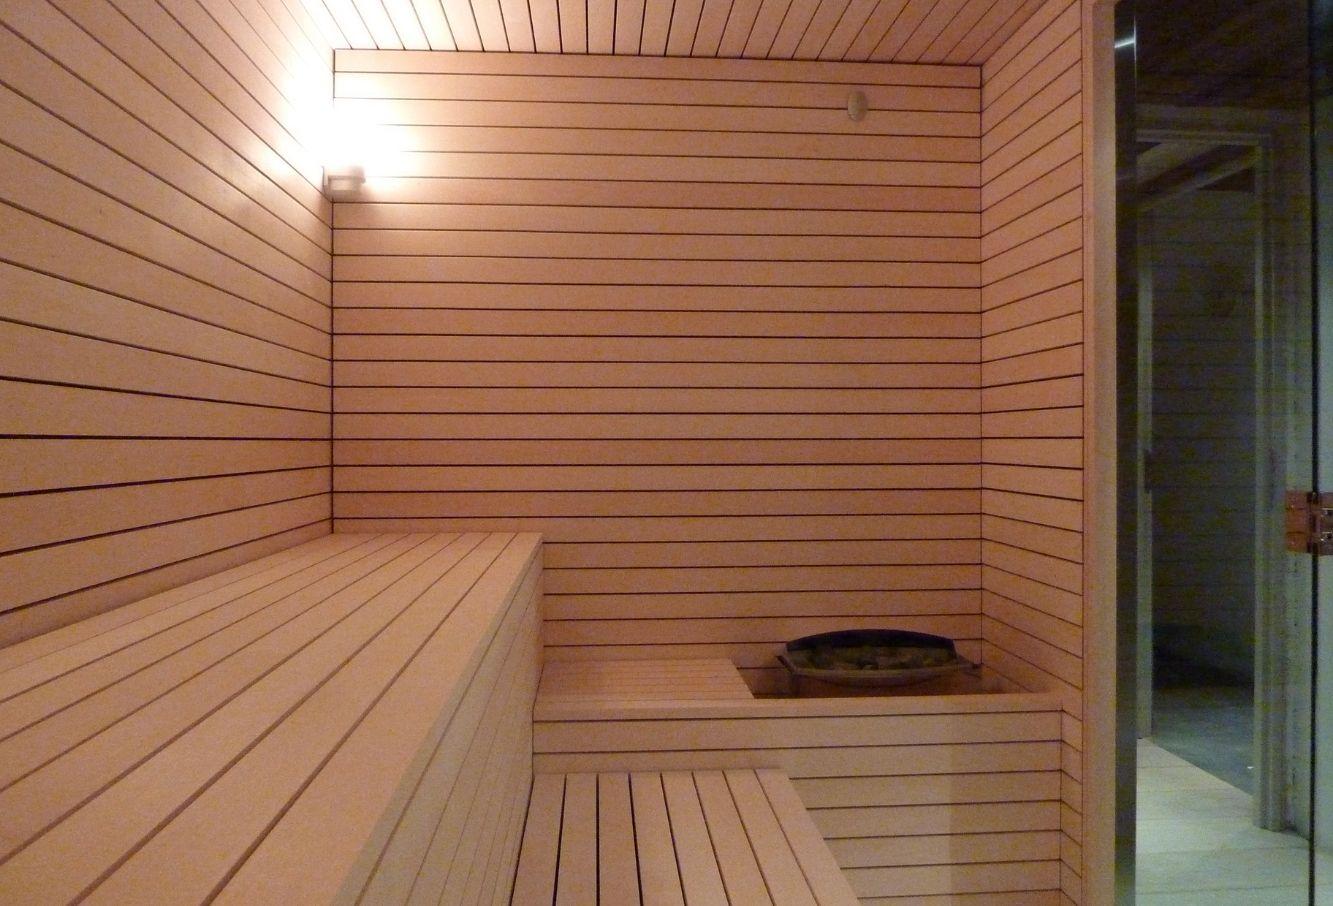 Sauna en tilleul